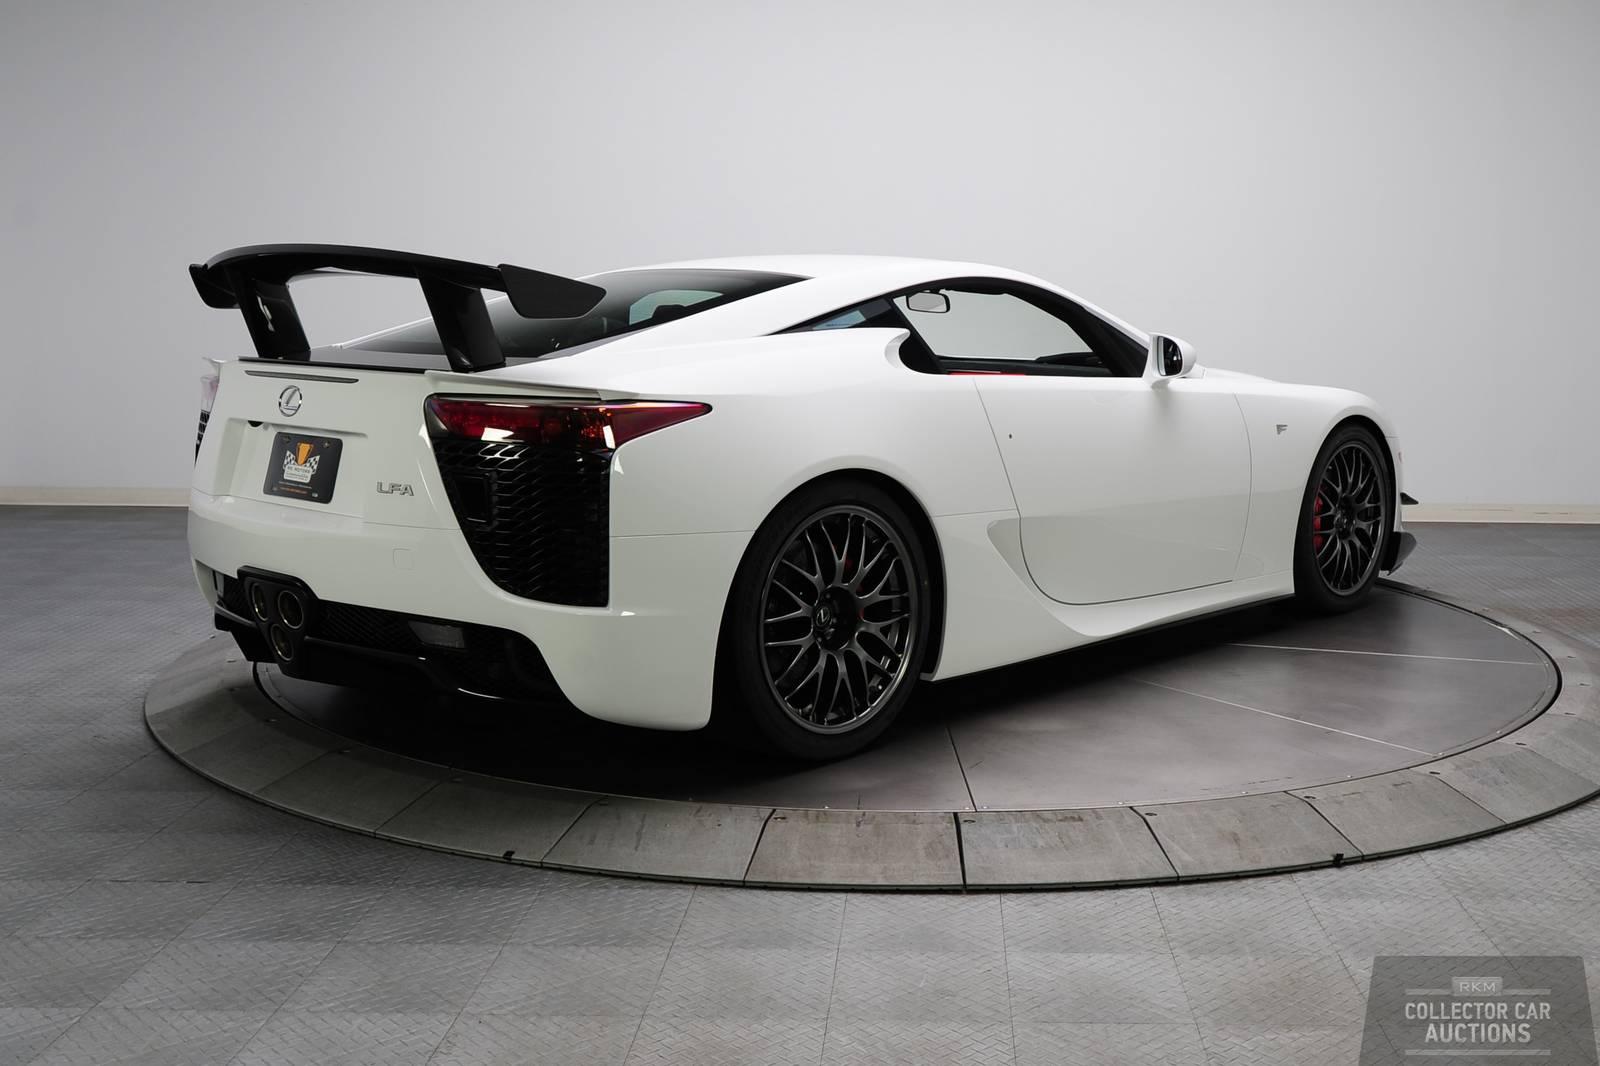 https://storage.googleapis.com/gtspirit/uploads/2013/11/auctions_2012-lexus-lfa-nurburgring_1776402.jpg